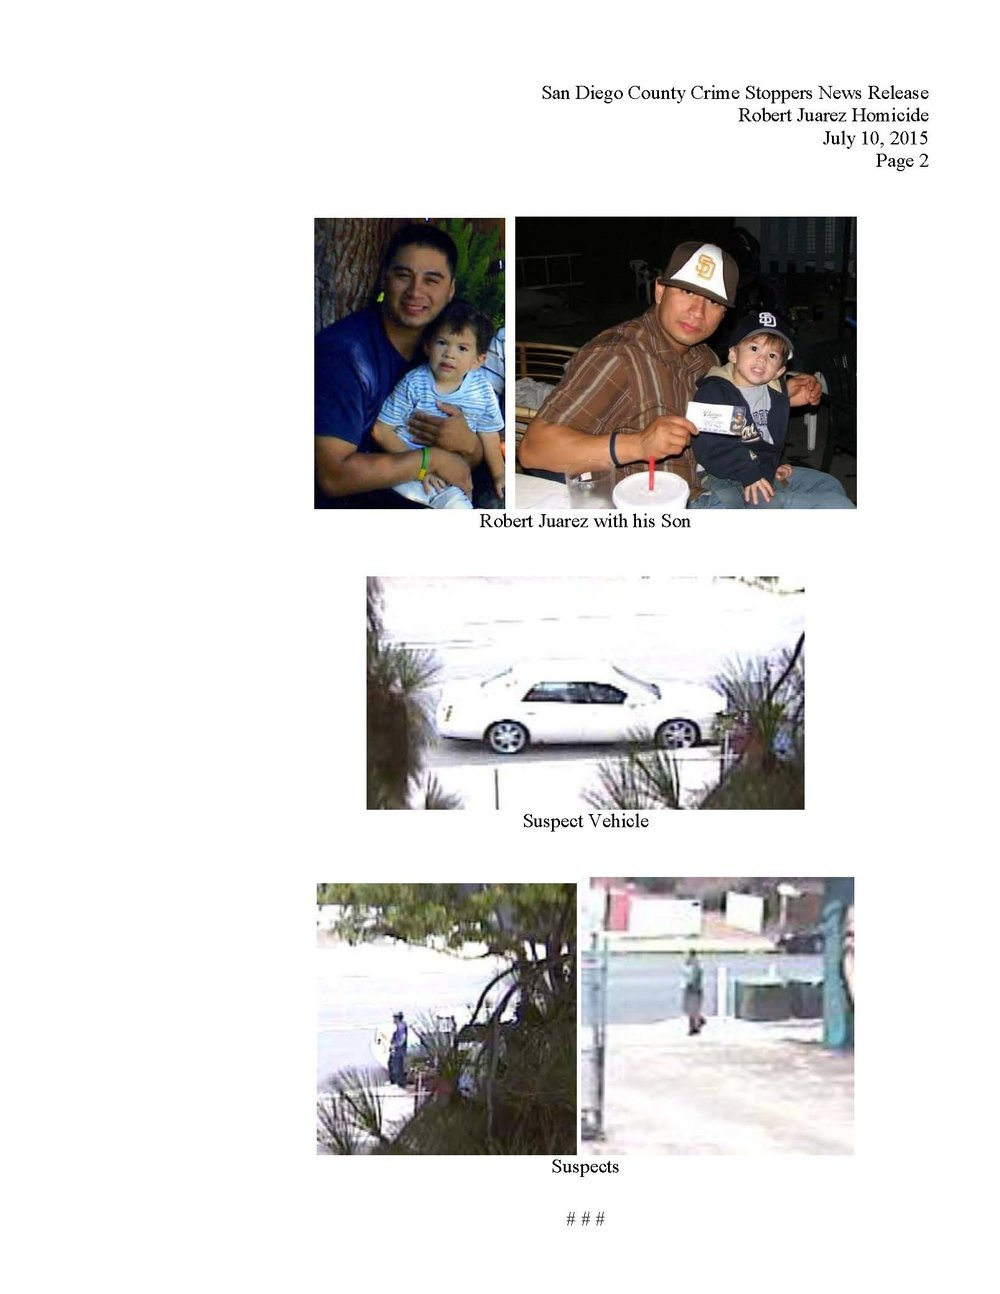 071015 Robert Juarez Homicide 7th Anniversary_Page_2